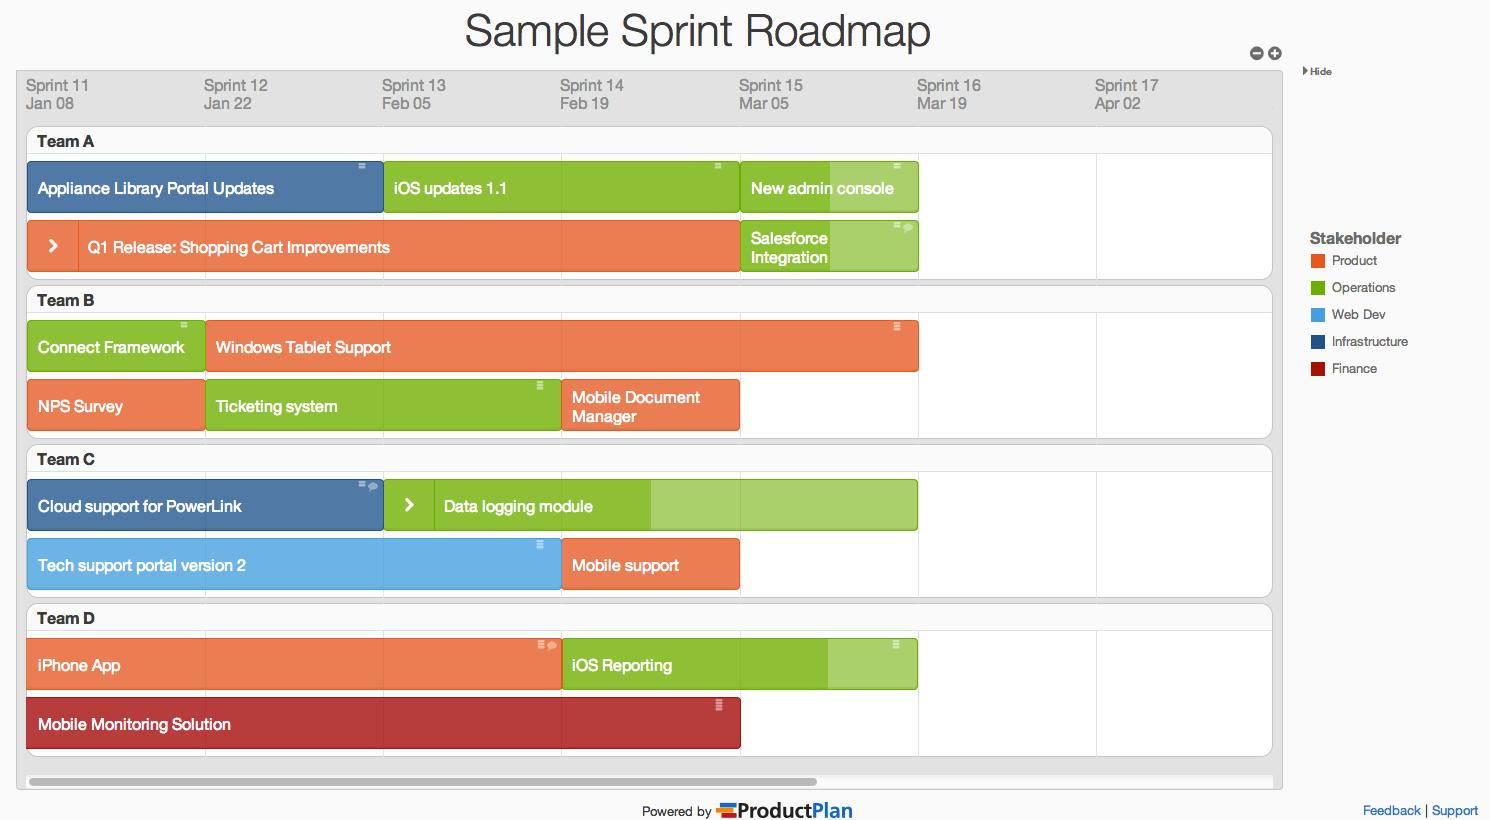 Three Sample Roadmap Views Created In Productplan